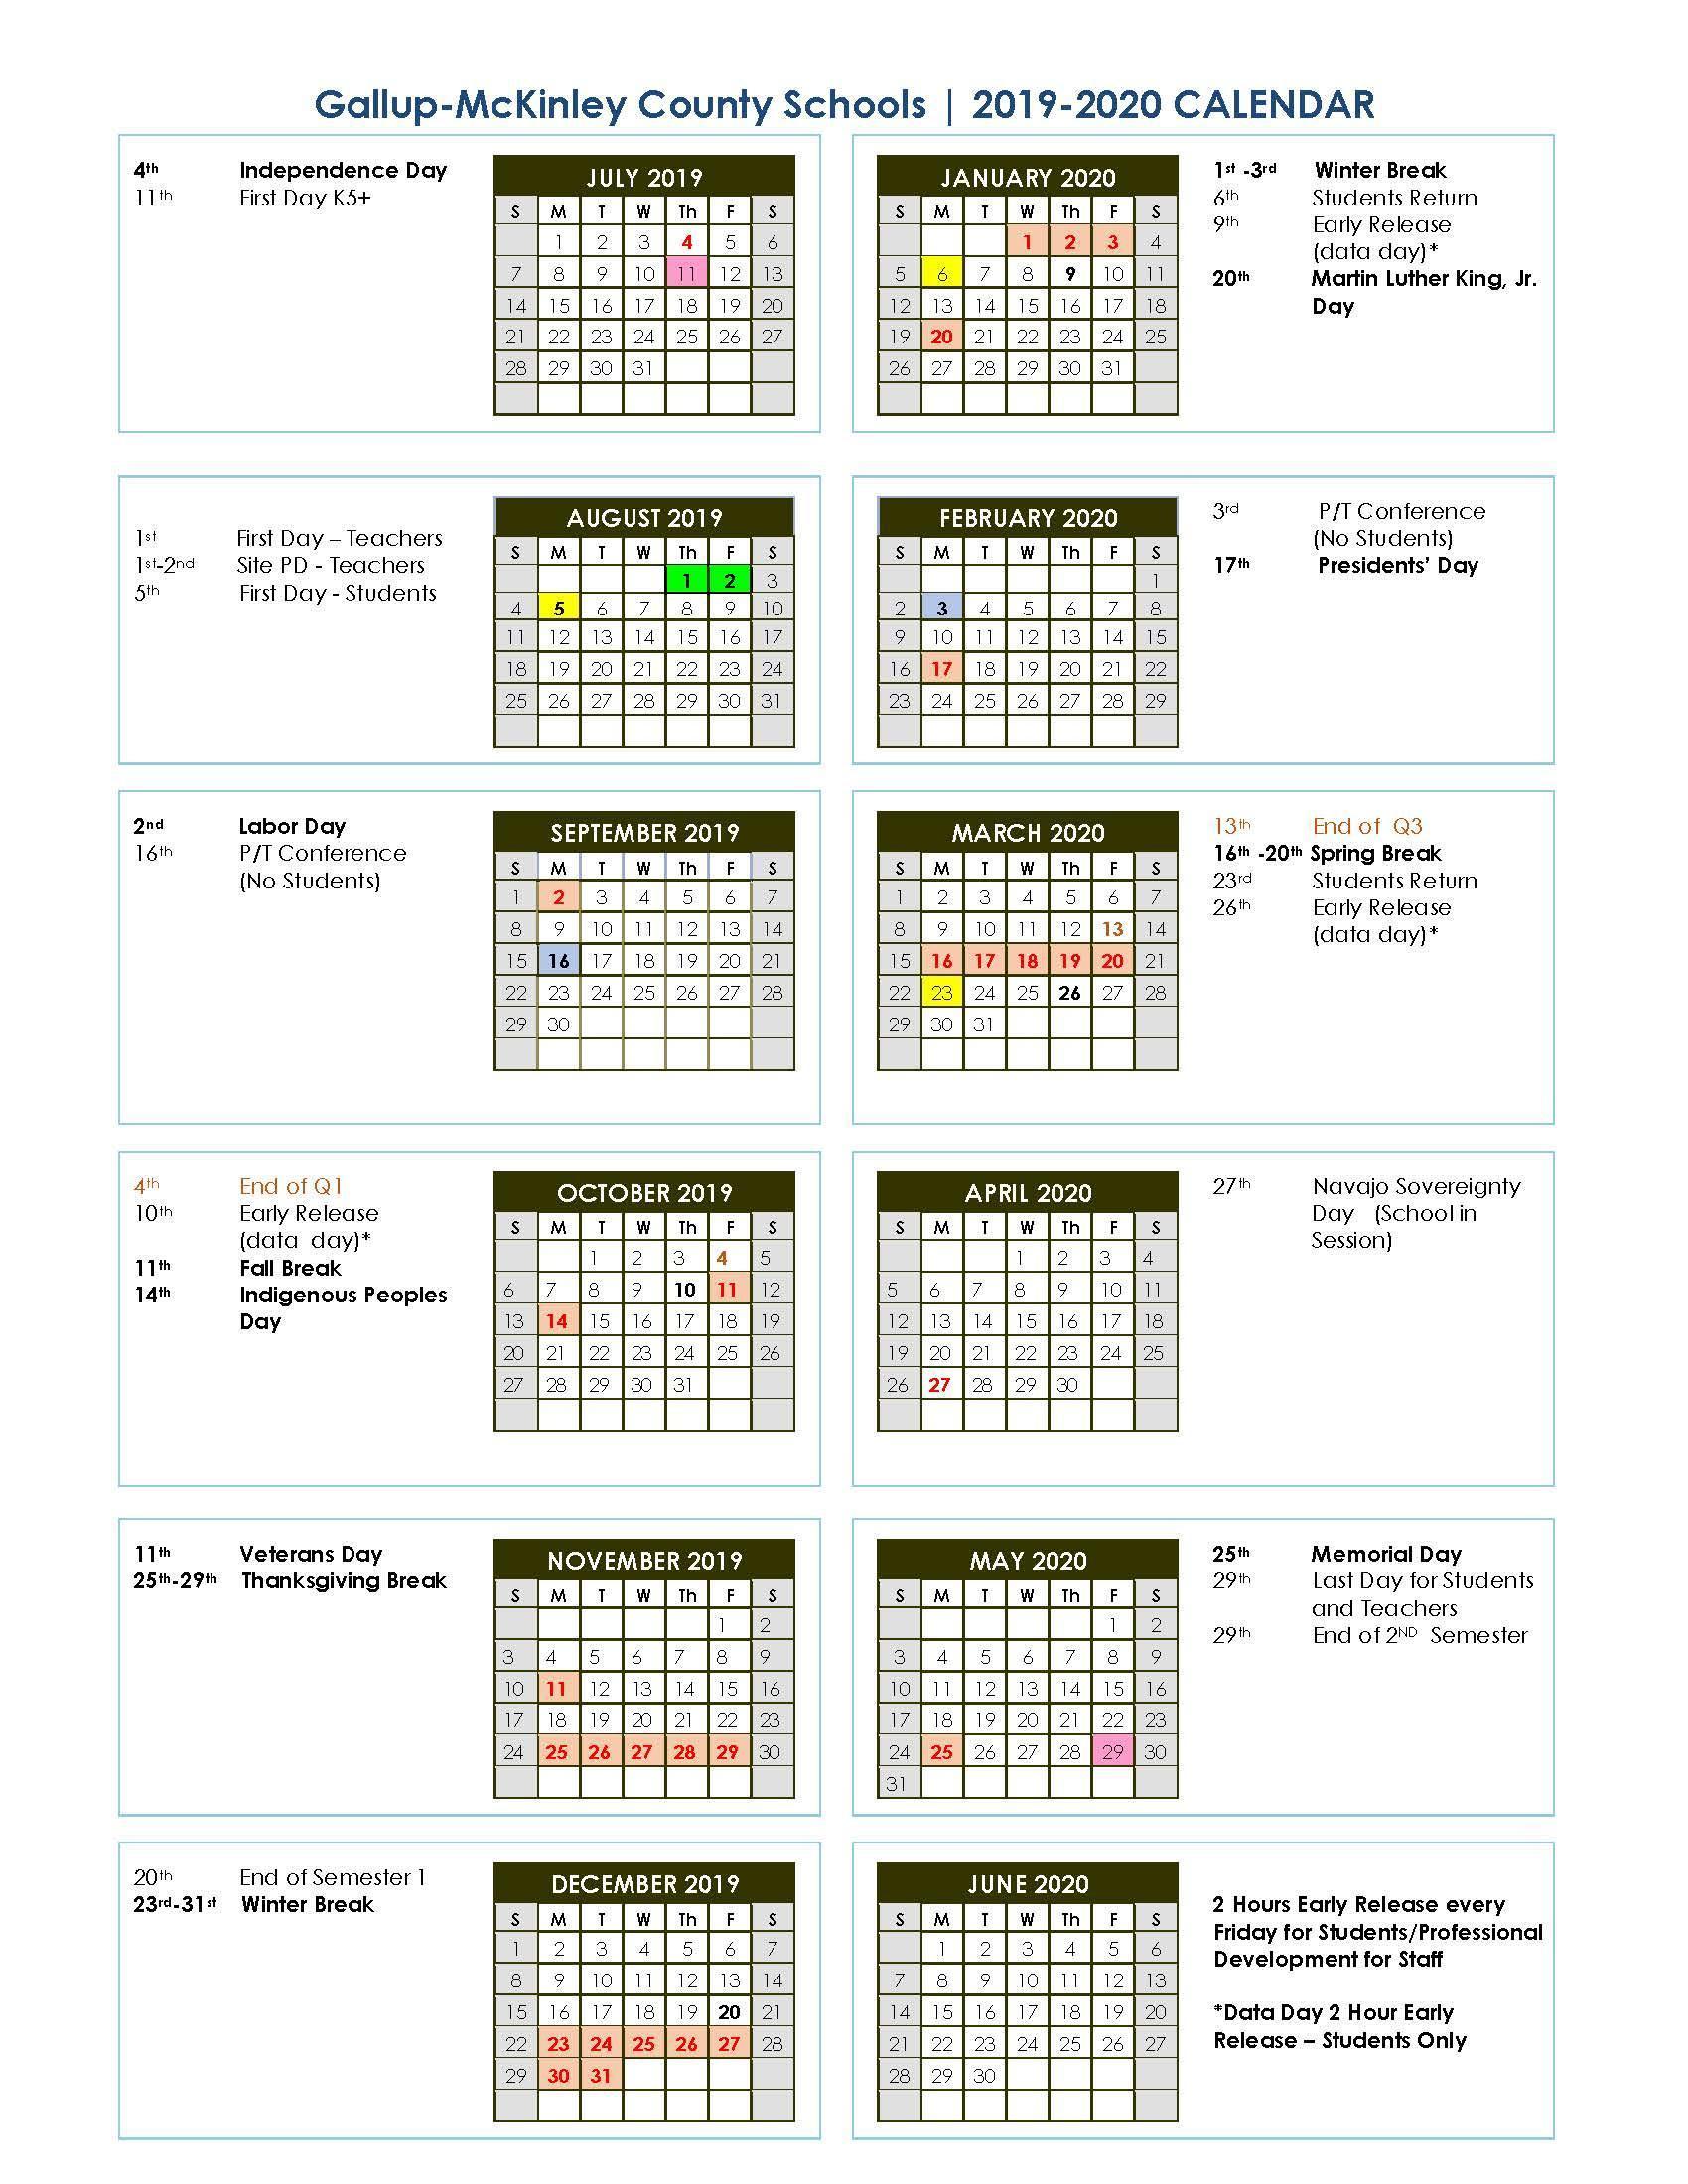 4 5 4 Retail Calendar 2021 2020   Printable Calendar 2020-2021 throughout Retsil 4 5 4 Cakander